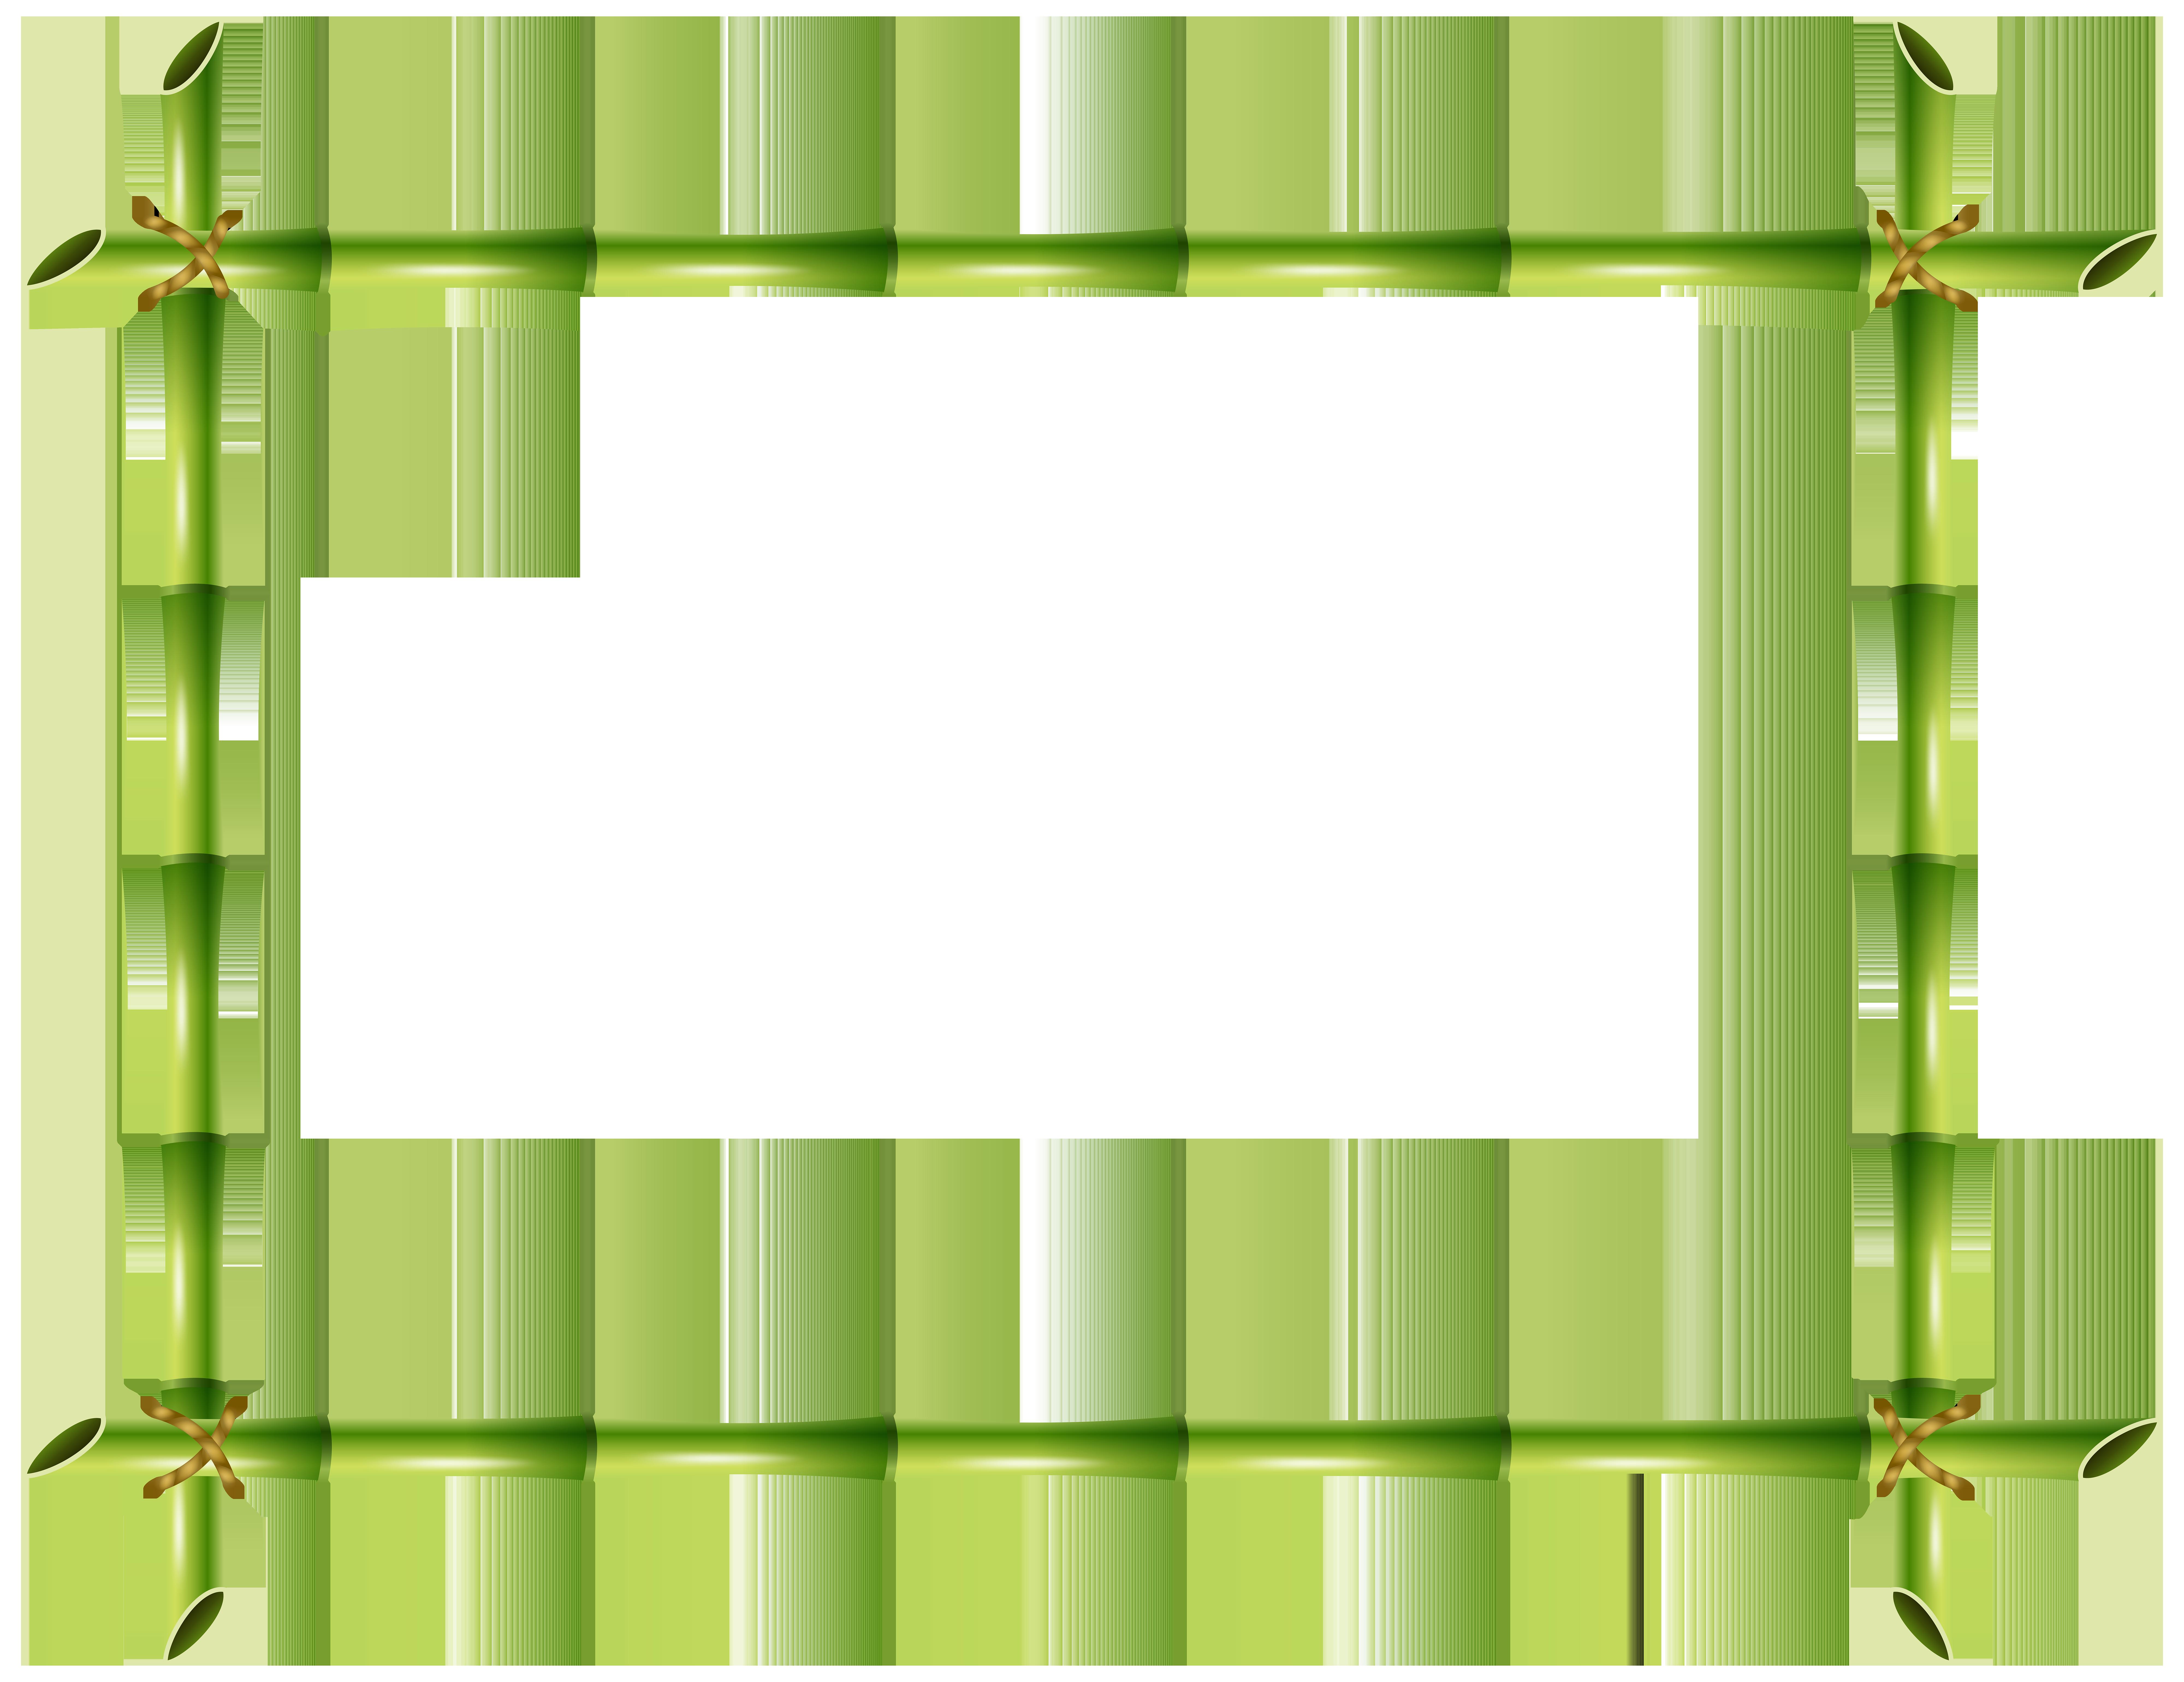 Transparent clip art image. Bamboo frame png